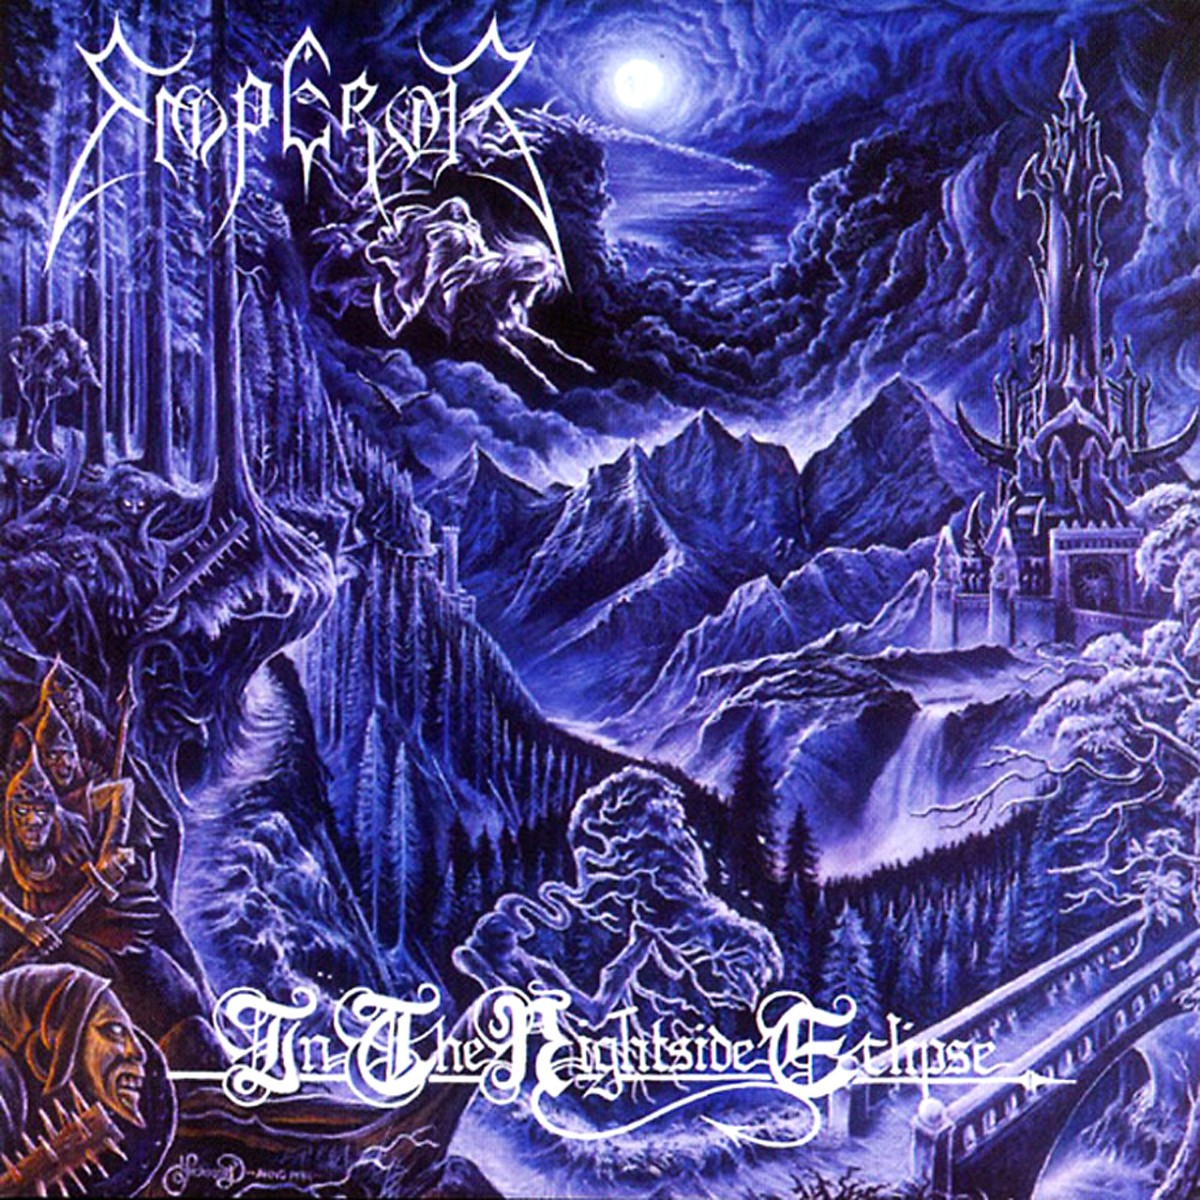 Emperor - Inno A Satana - YouTube